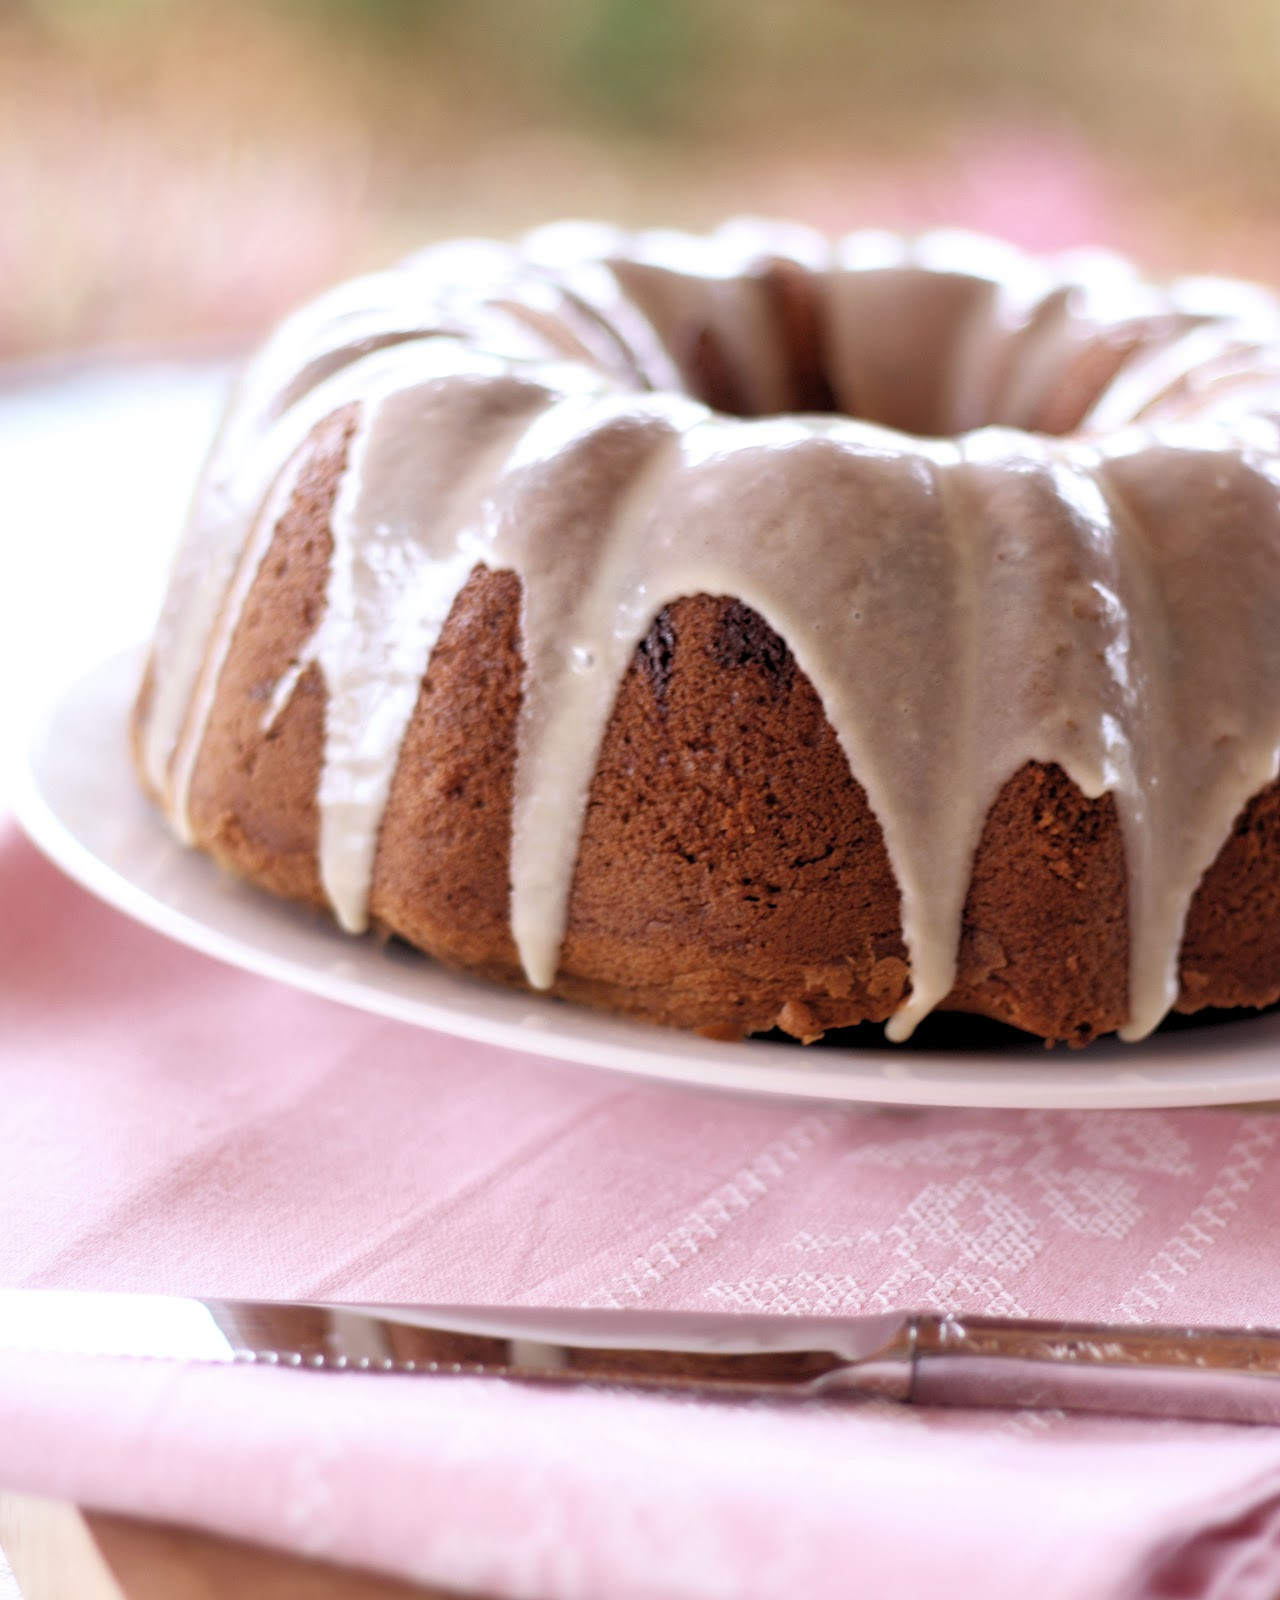 Pound Cake Glaze  Brown Sugar and Chocolate Chip Pound Cake with Maple Glaze